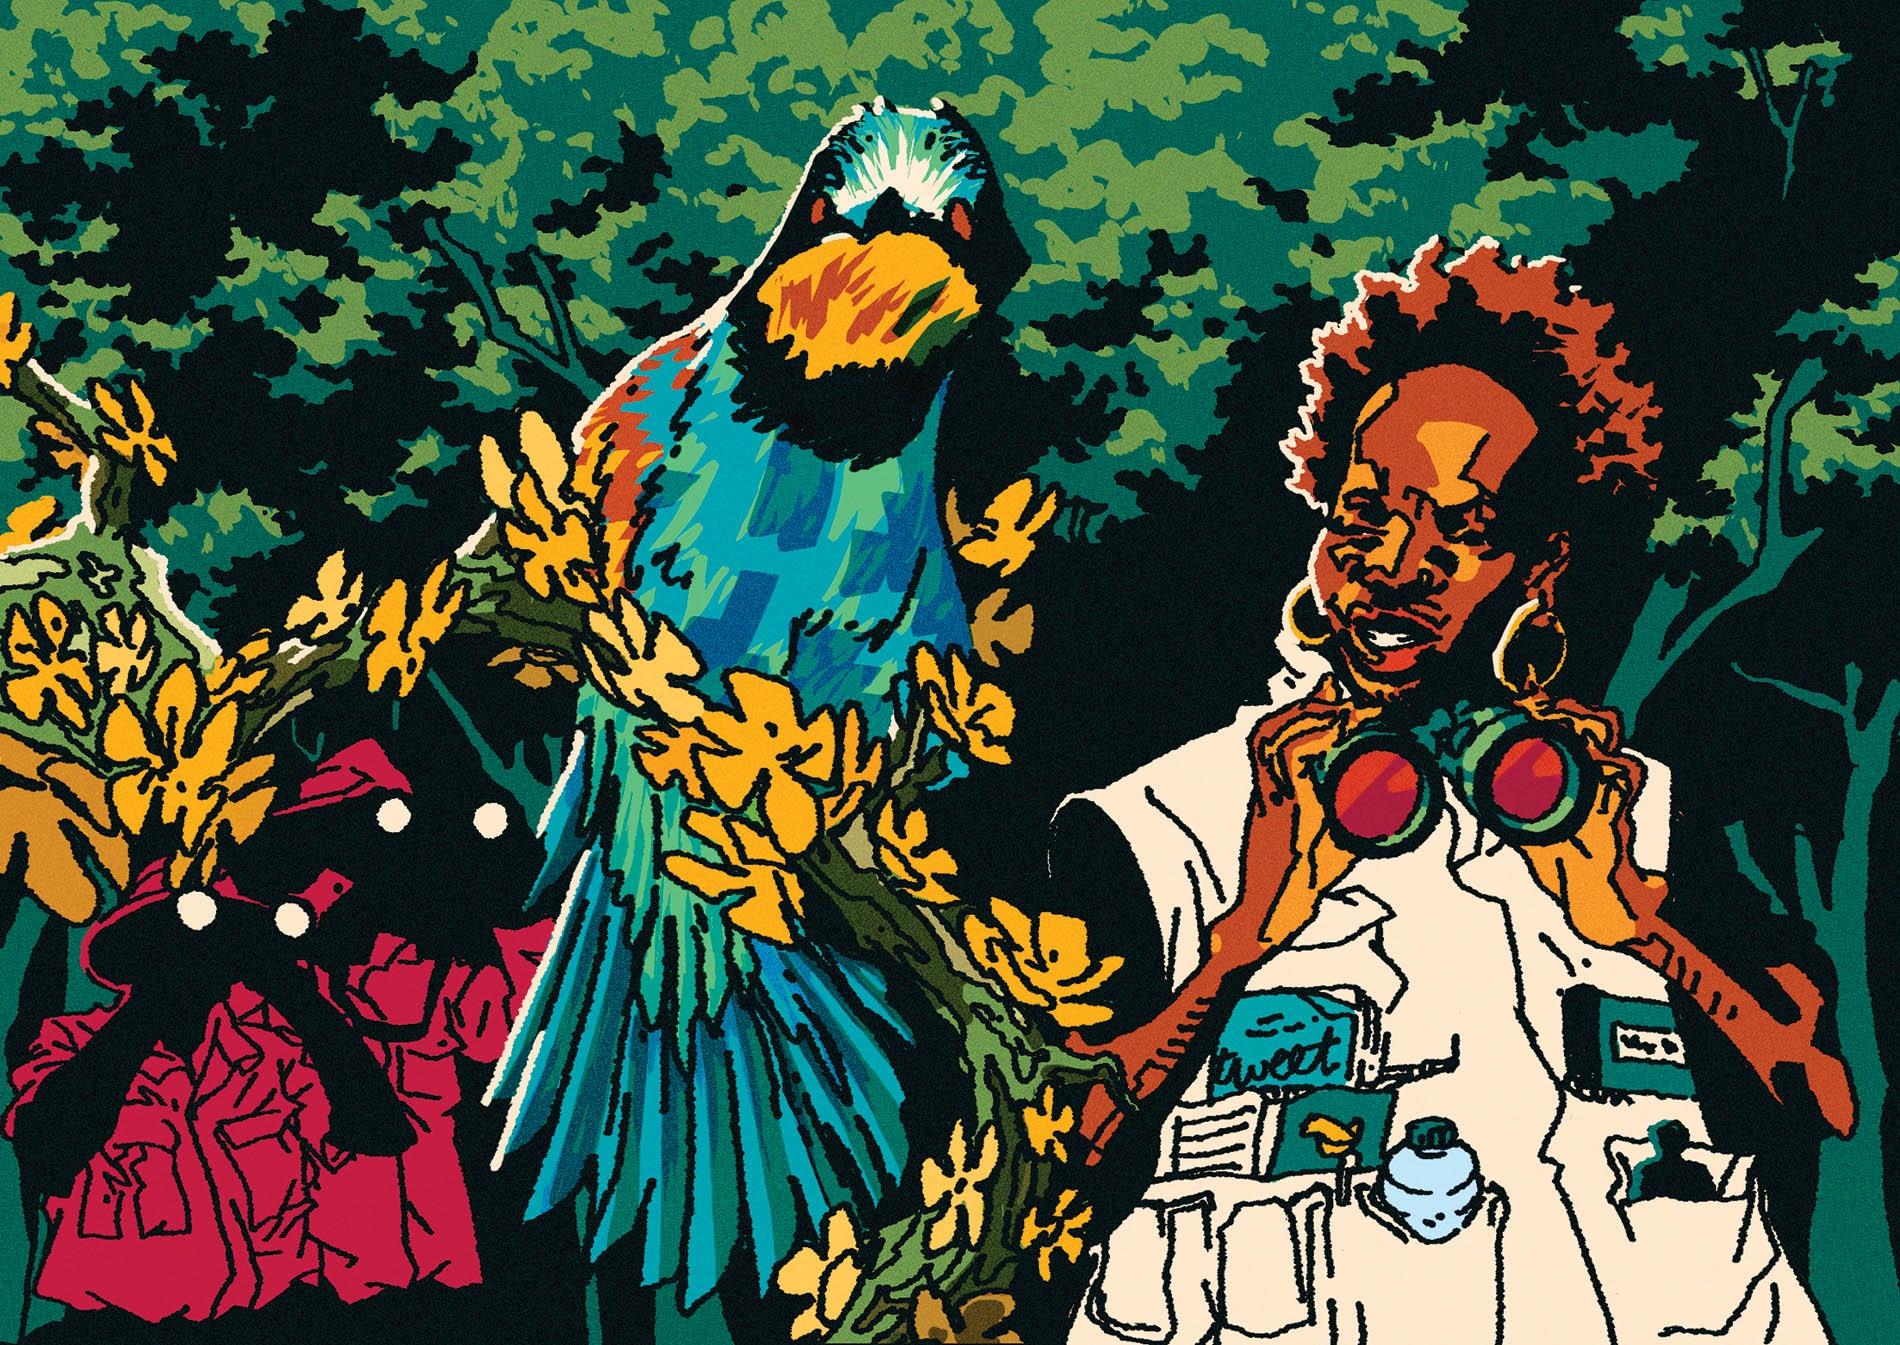 Illustration by Pola Maneli